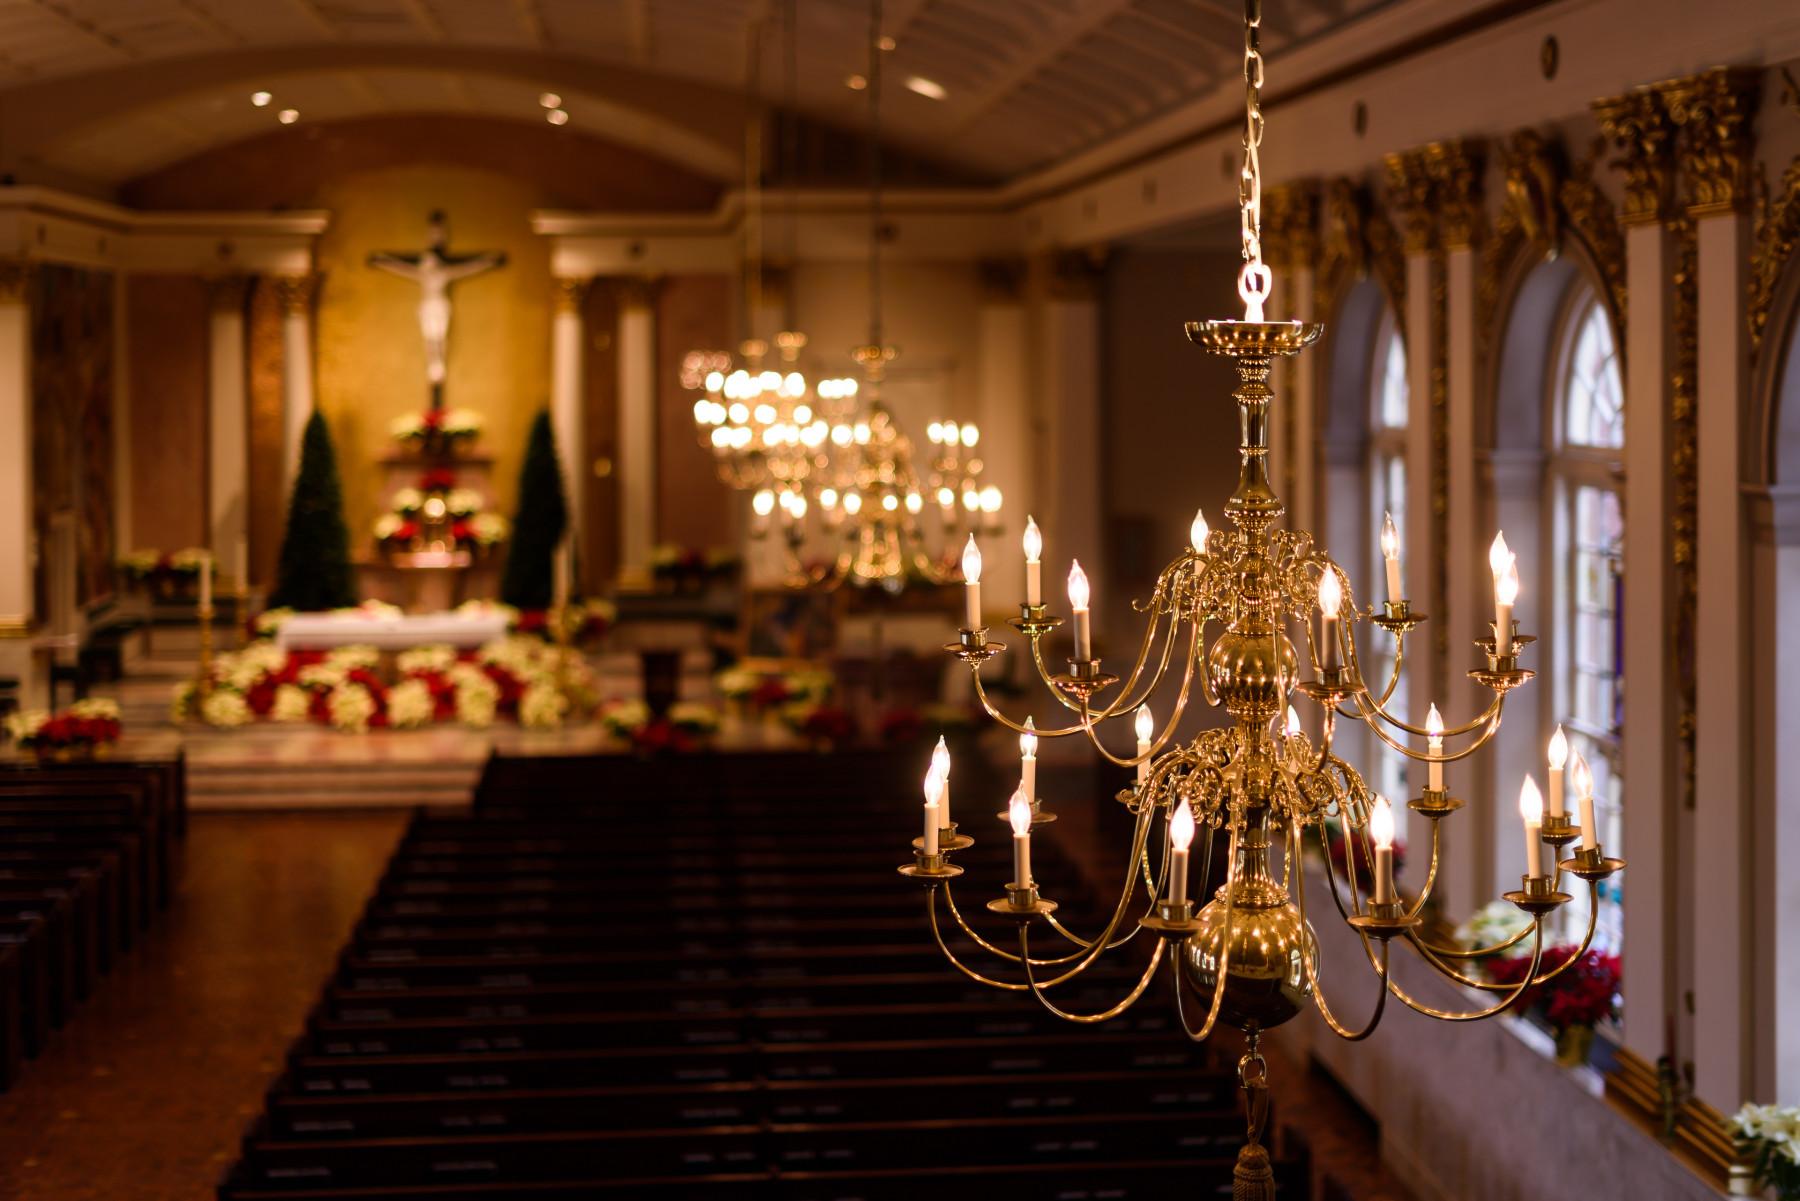 St. Catharine of Siena Allentown lighting